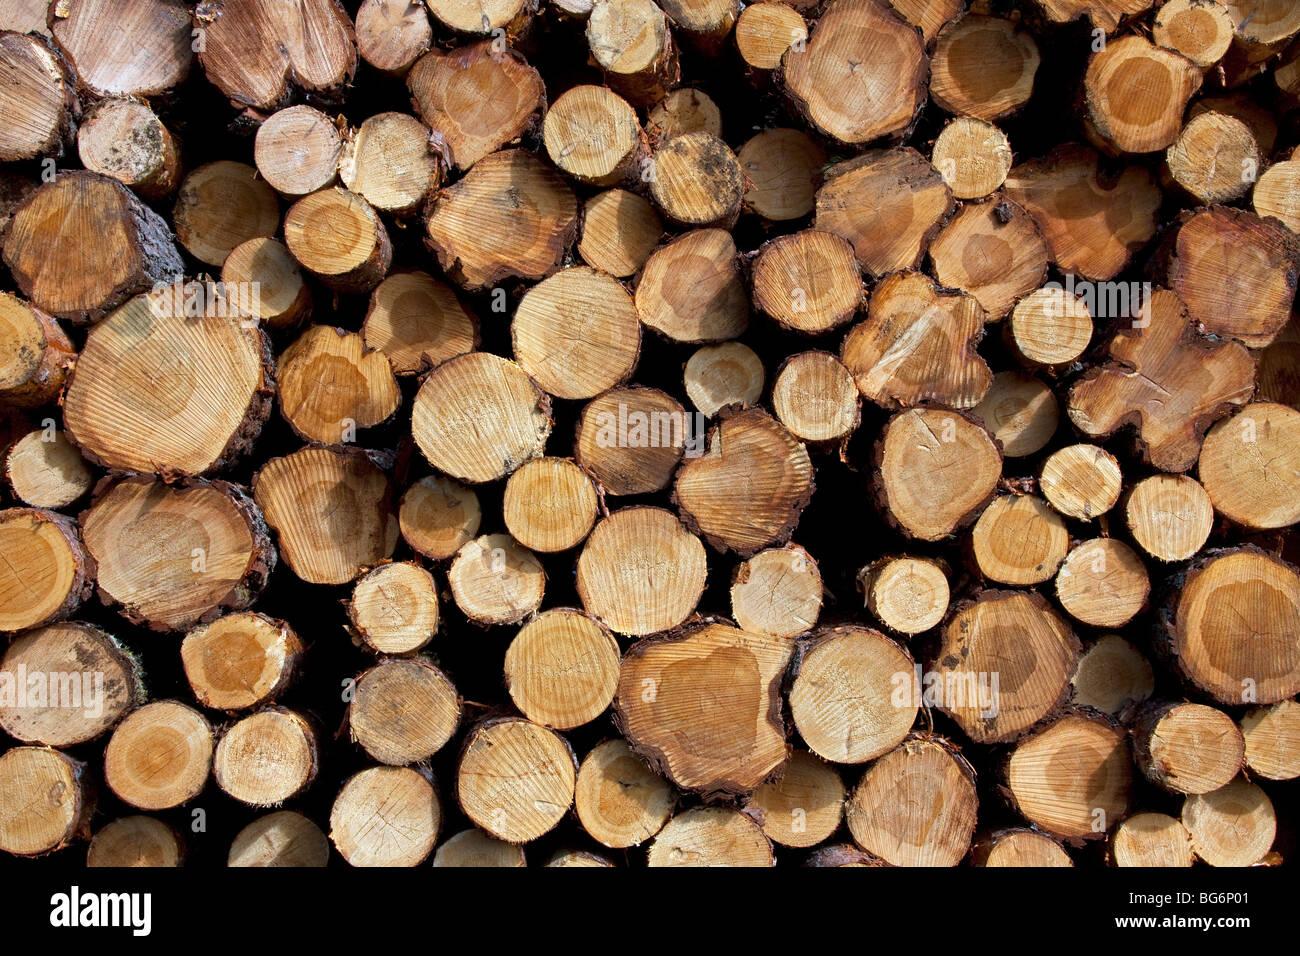 Protokollierung-Industrie zeigt Haufen Schnitt protokolliert / Bäume / Holz aus Wald Stockbild